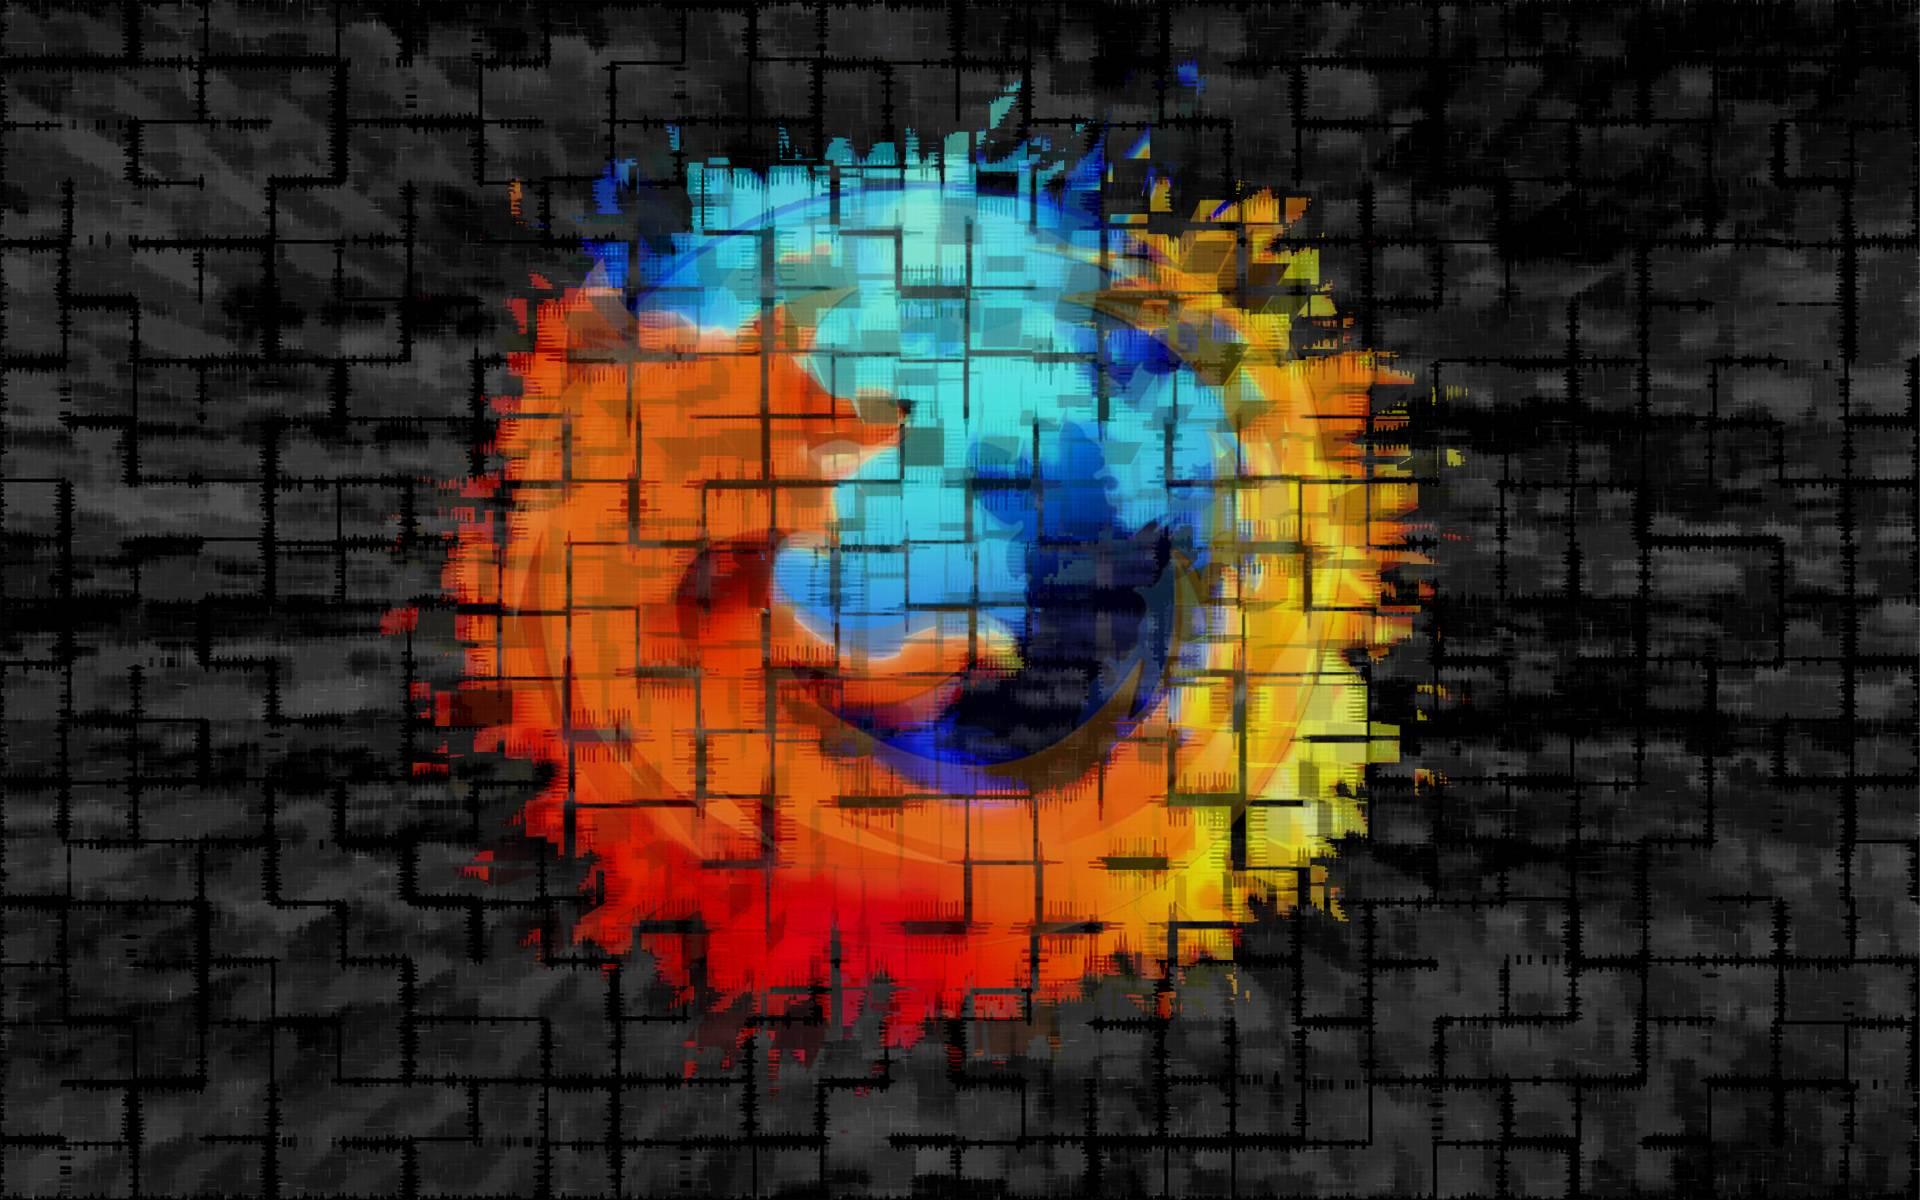 wallpaper geeky imagenes - photo #38